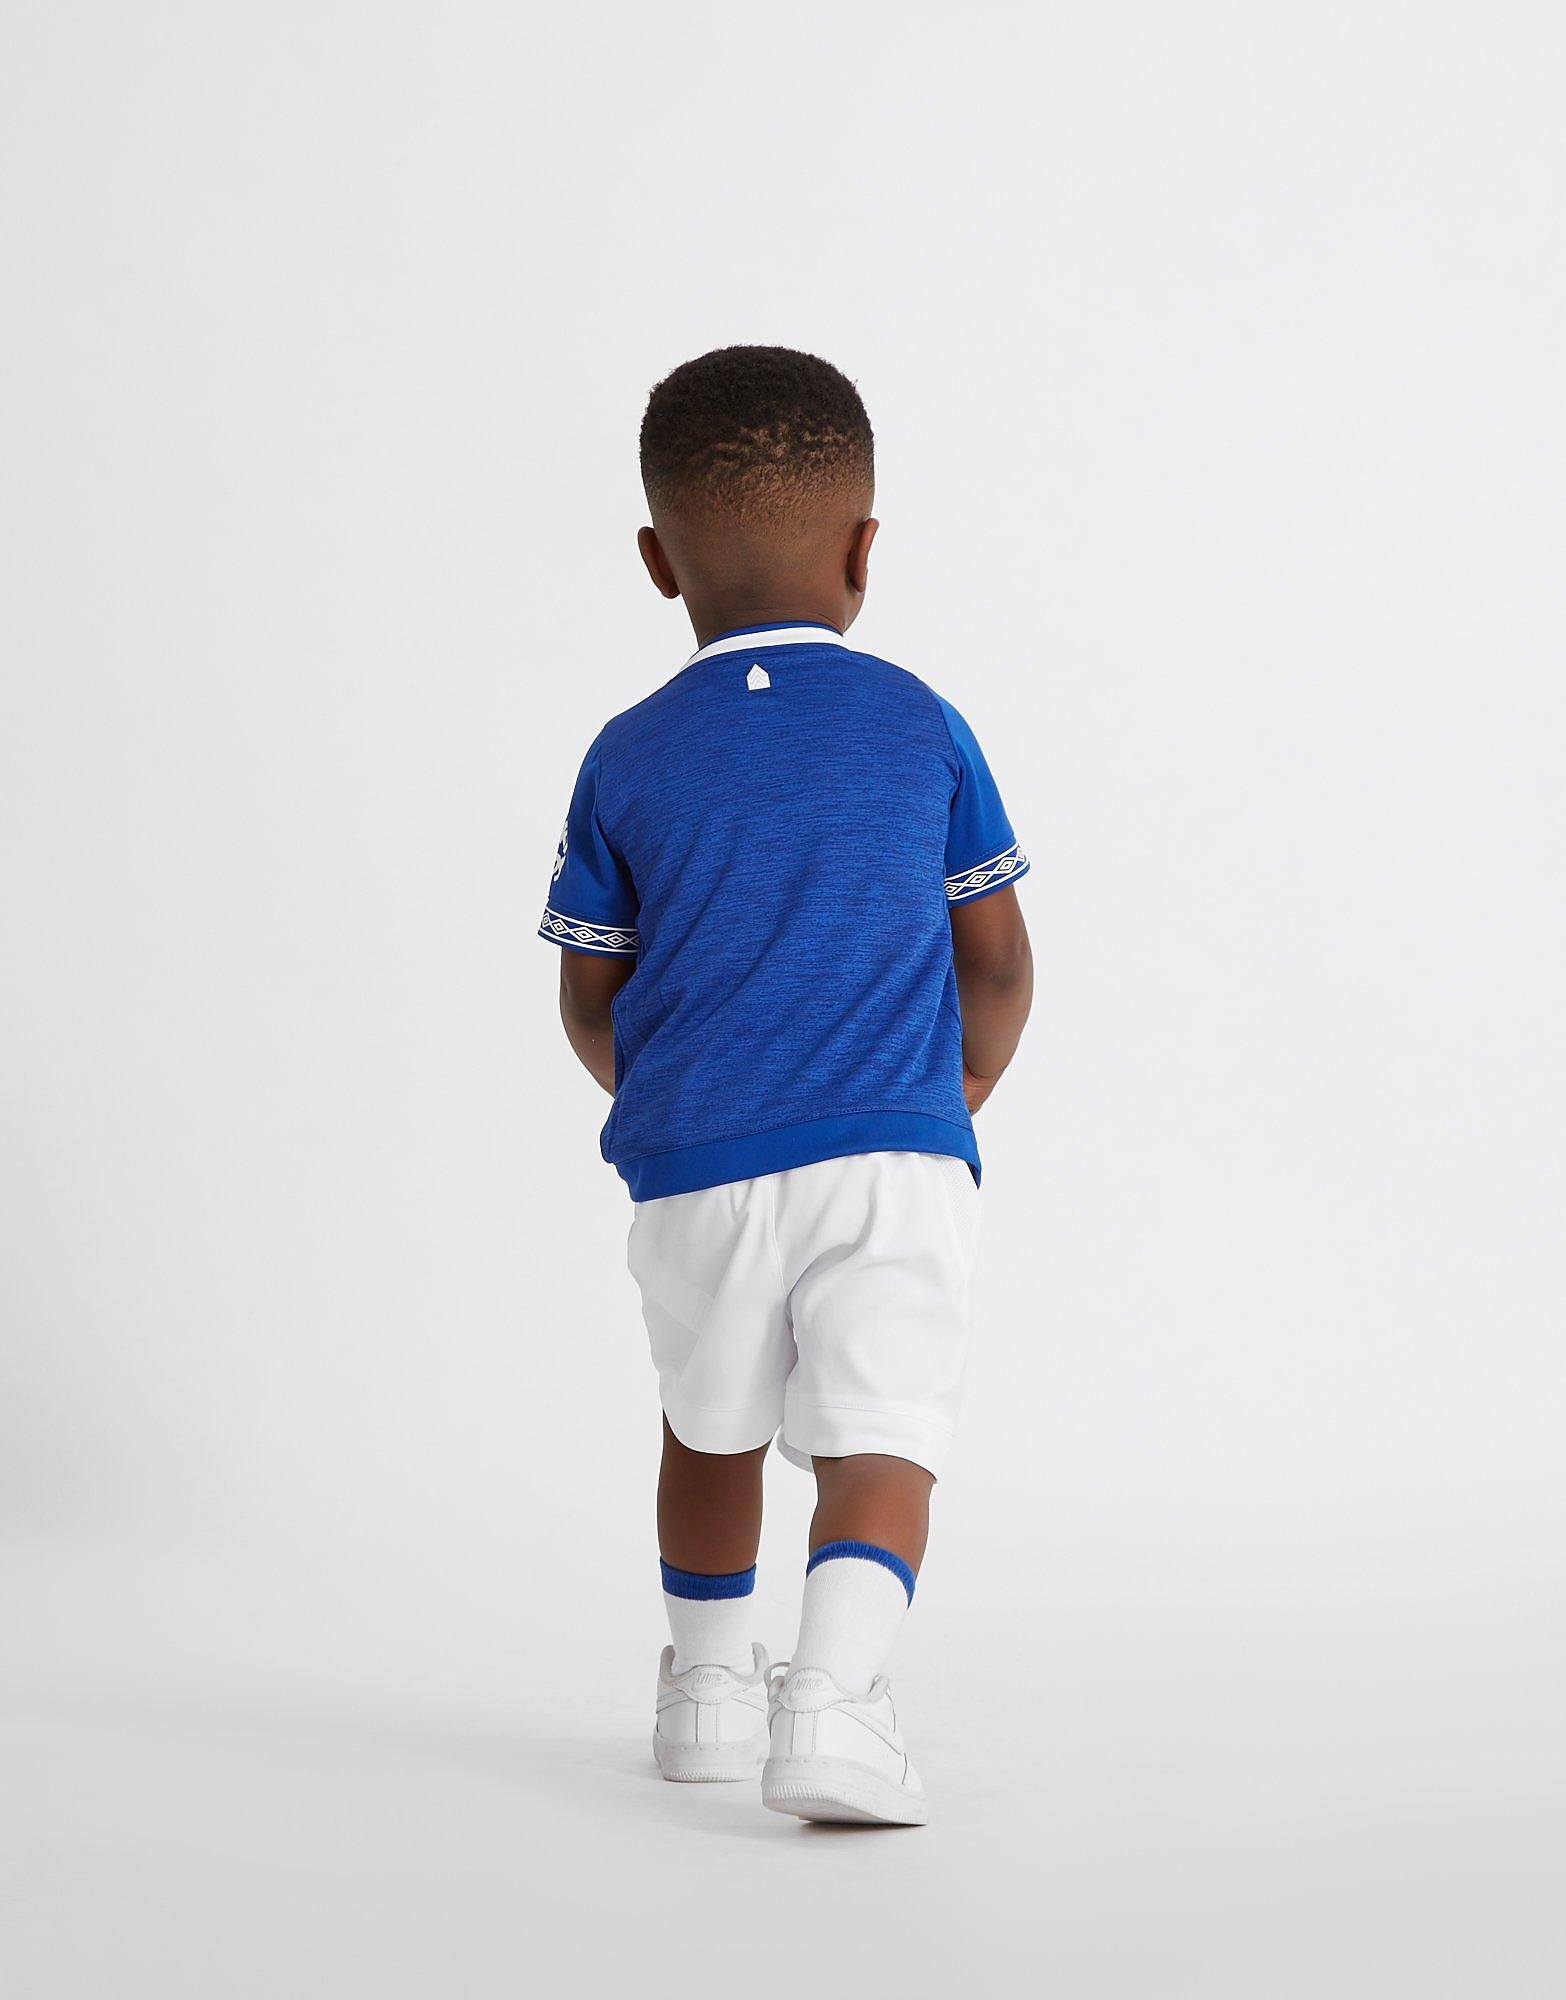 Umbro Everton FC 2018/19 Home Kit Baby's